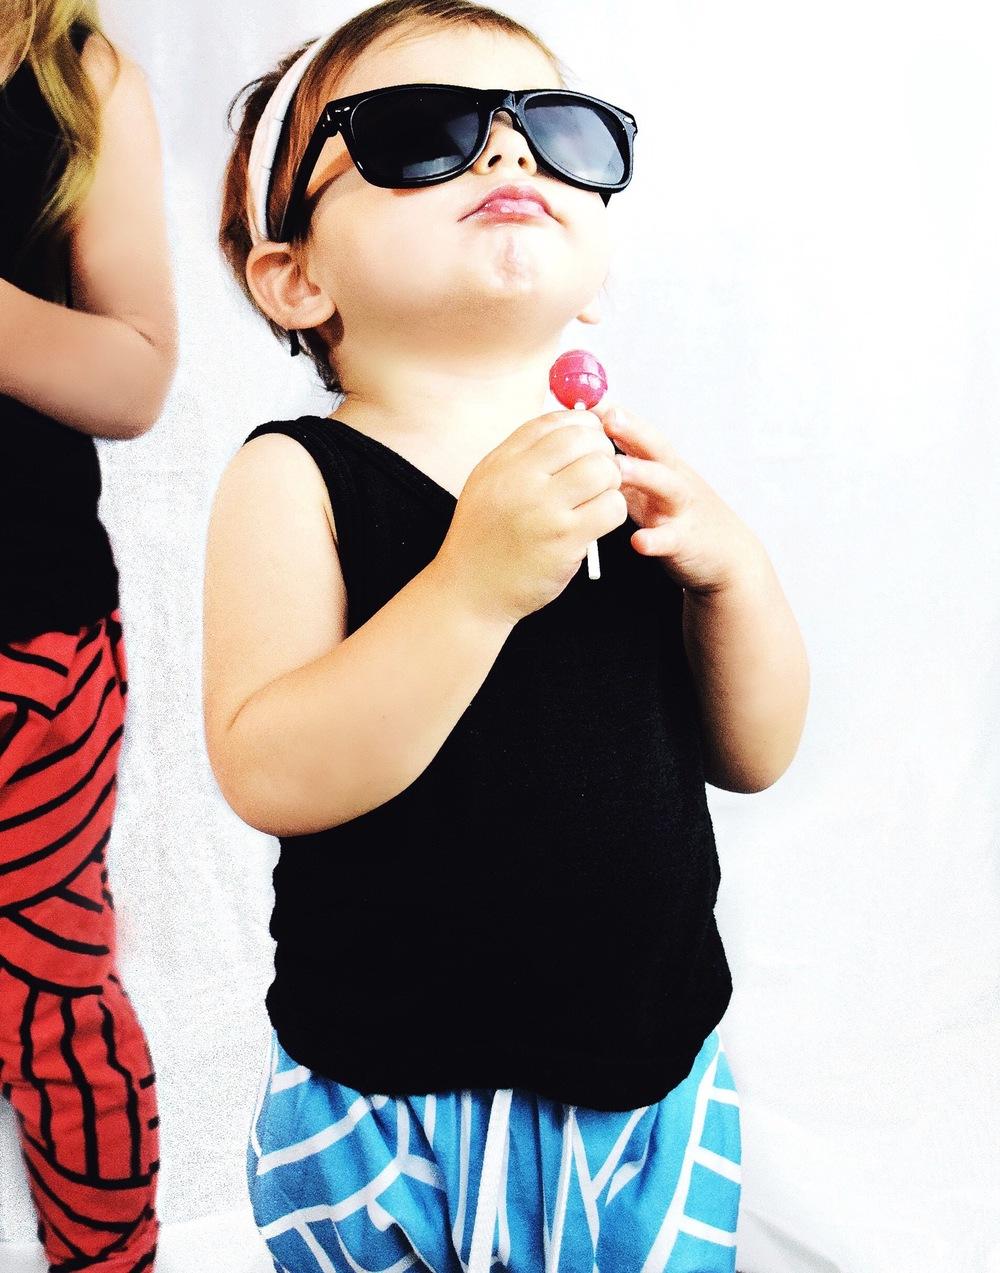 Baby girl harem leggings / joggers in ocean blue and sunglasses